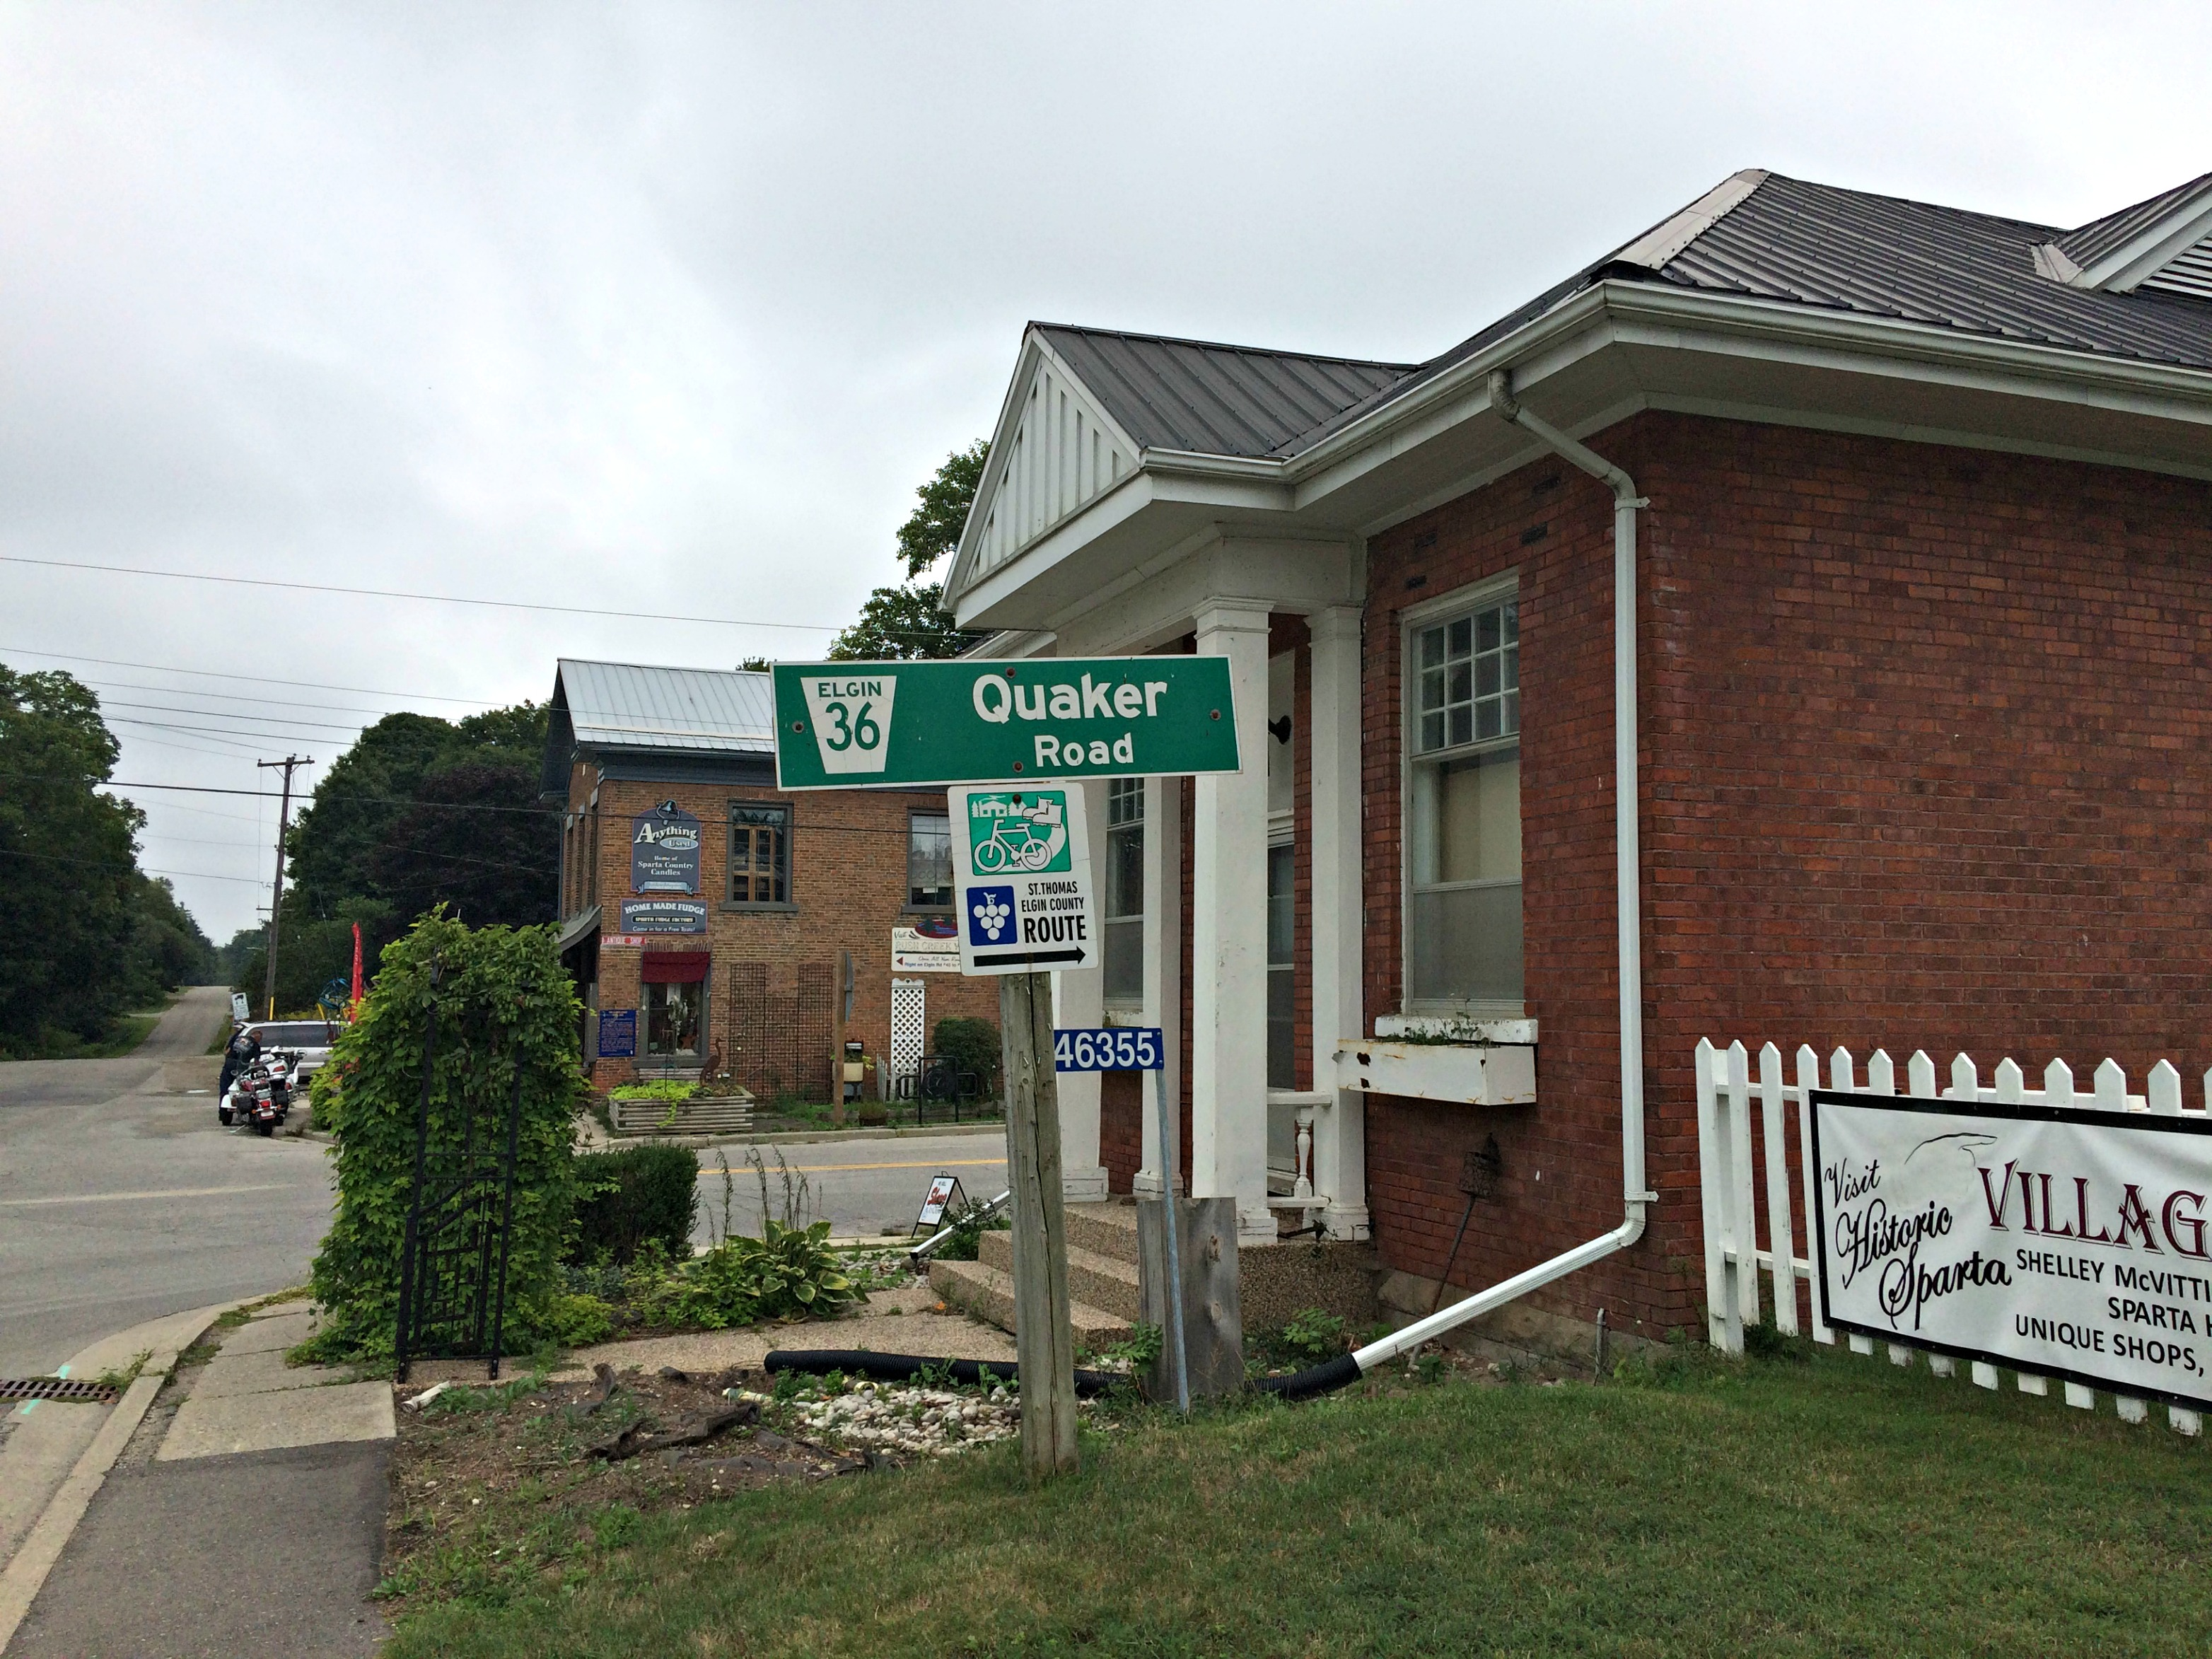 Sparta Village in Southern Ontario @ GagenGirls.com